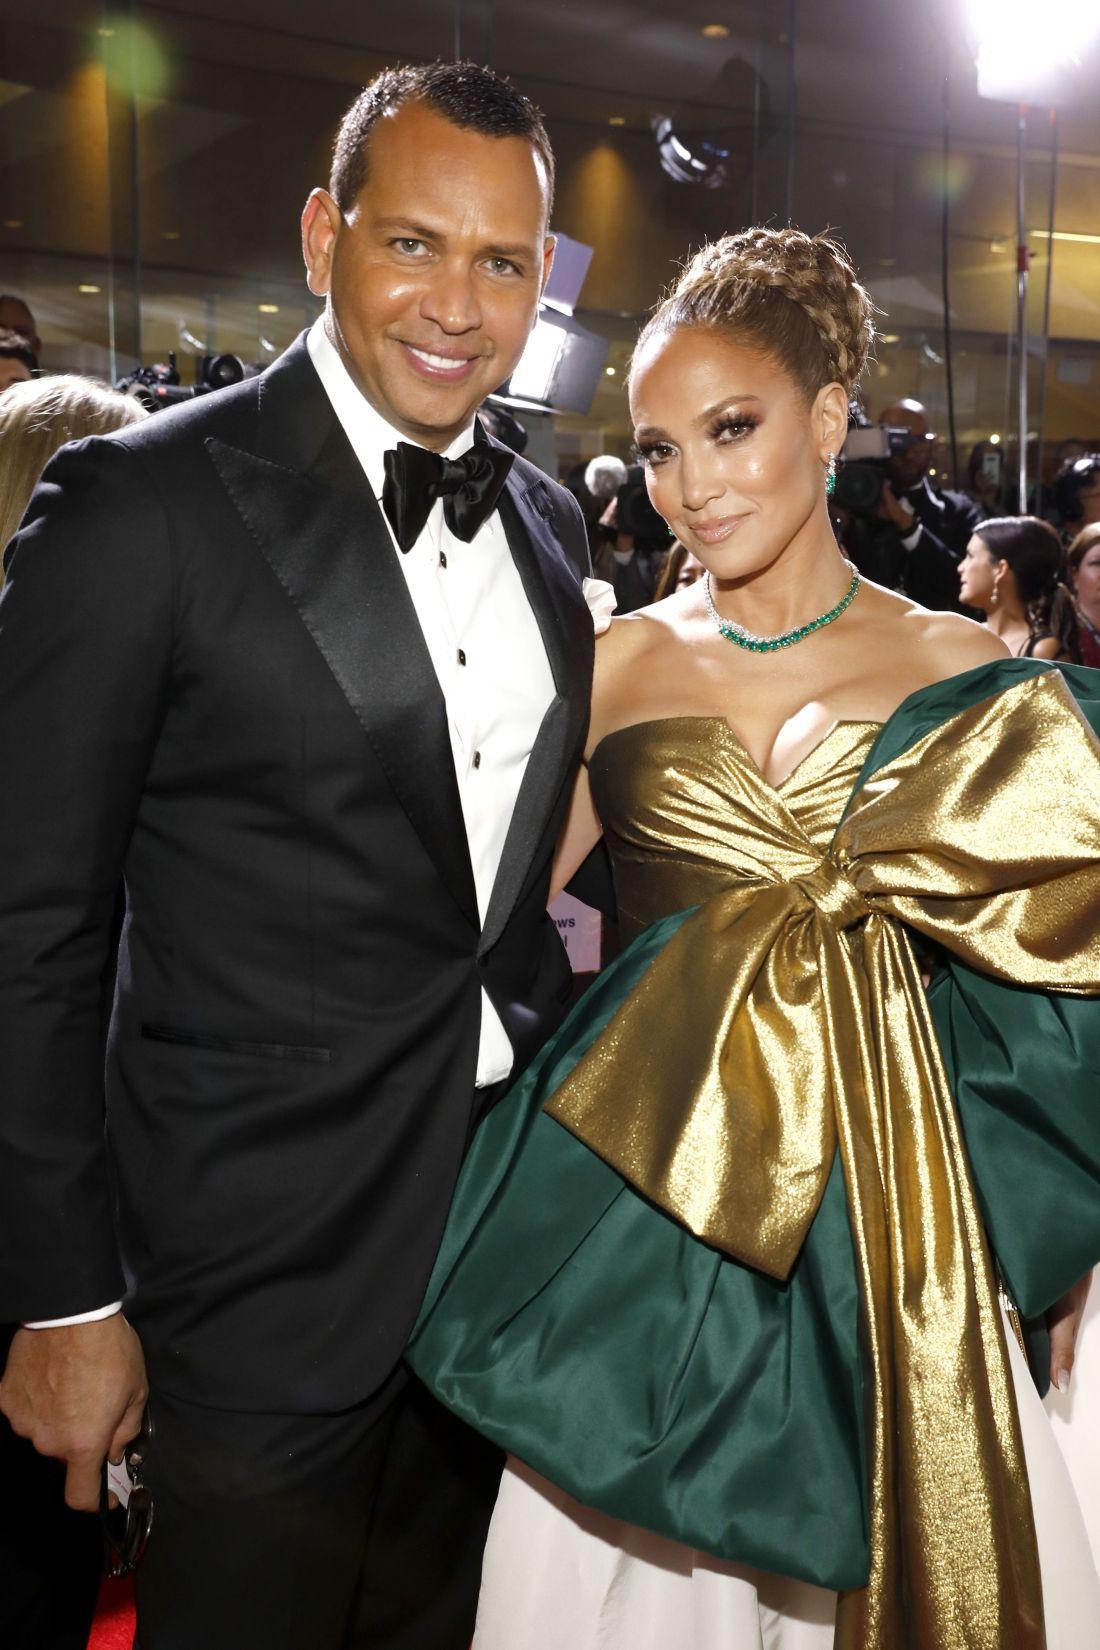 Jennifer Lopez Post Photos Without Her $1.8 Million Diamond Engagement Ring